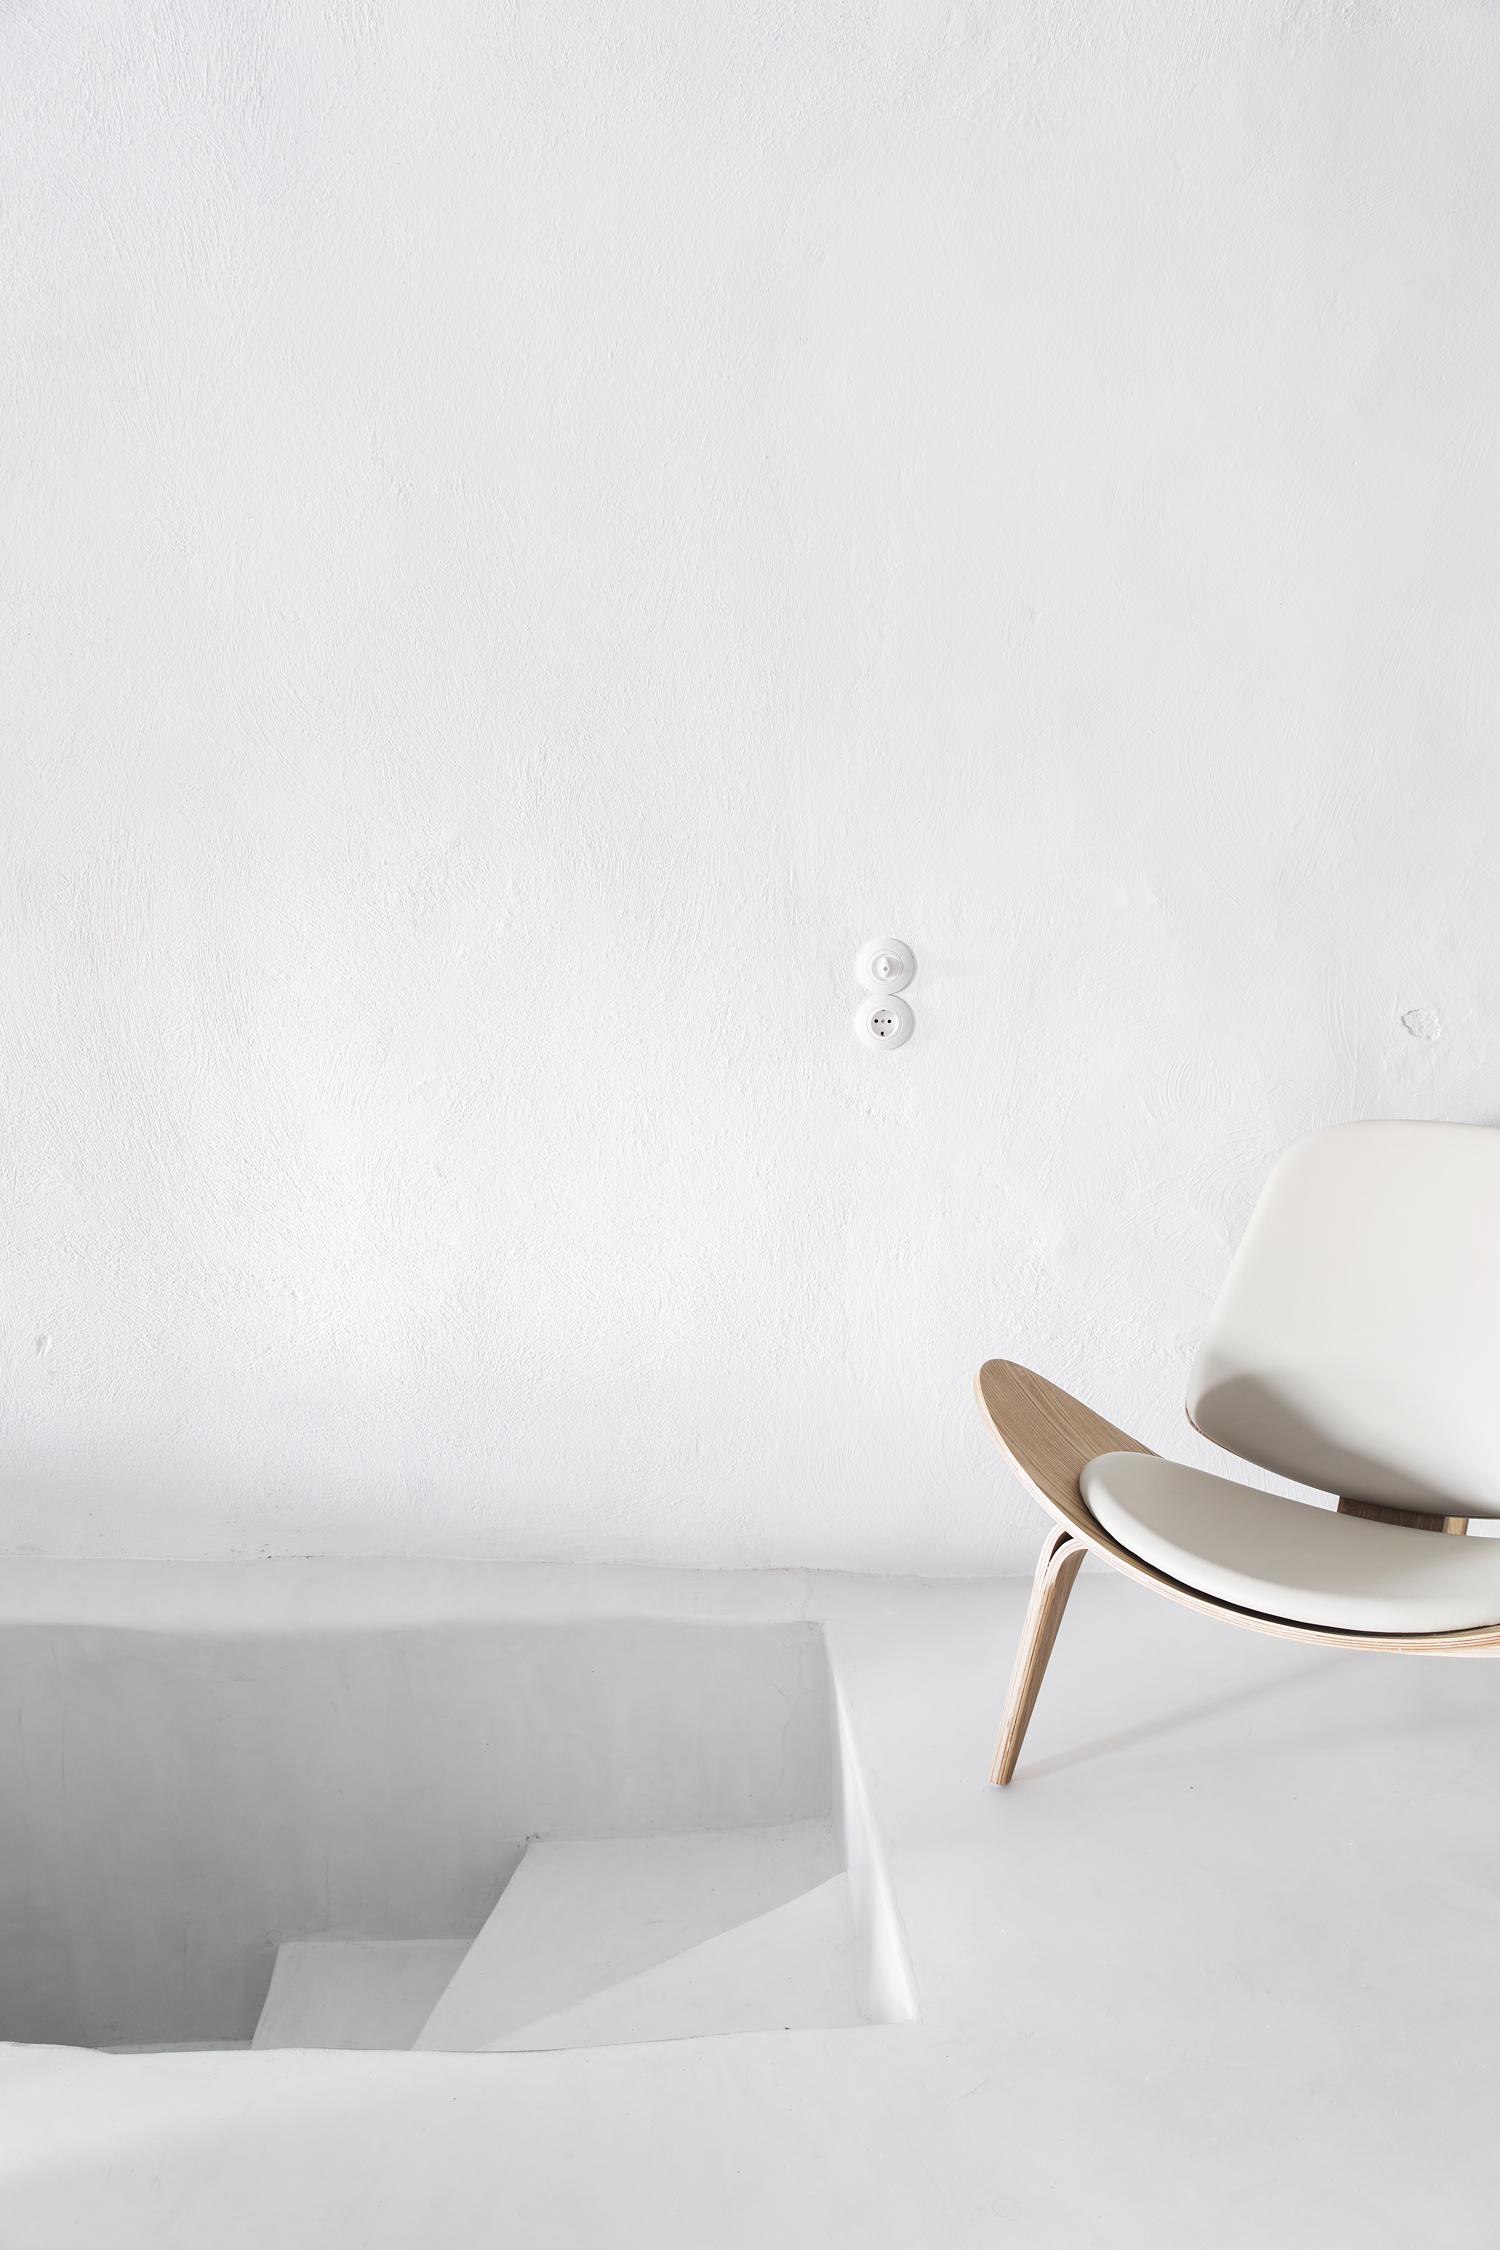 Collaboration with Sophia Luxury Suites, Santorini.